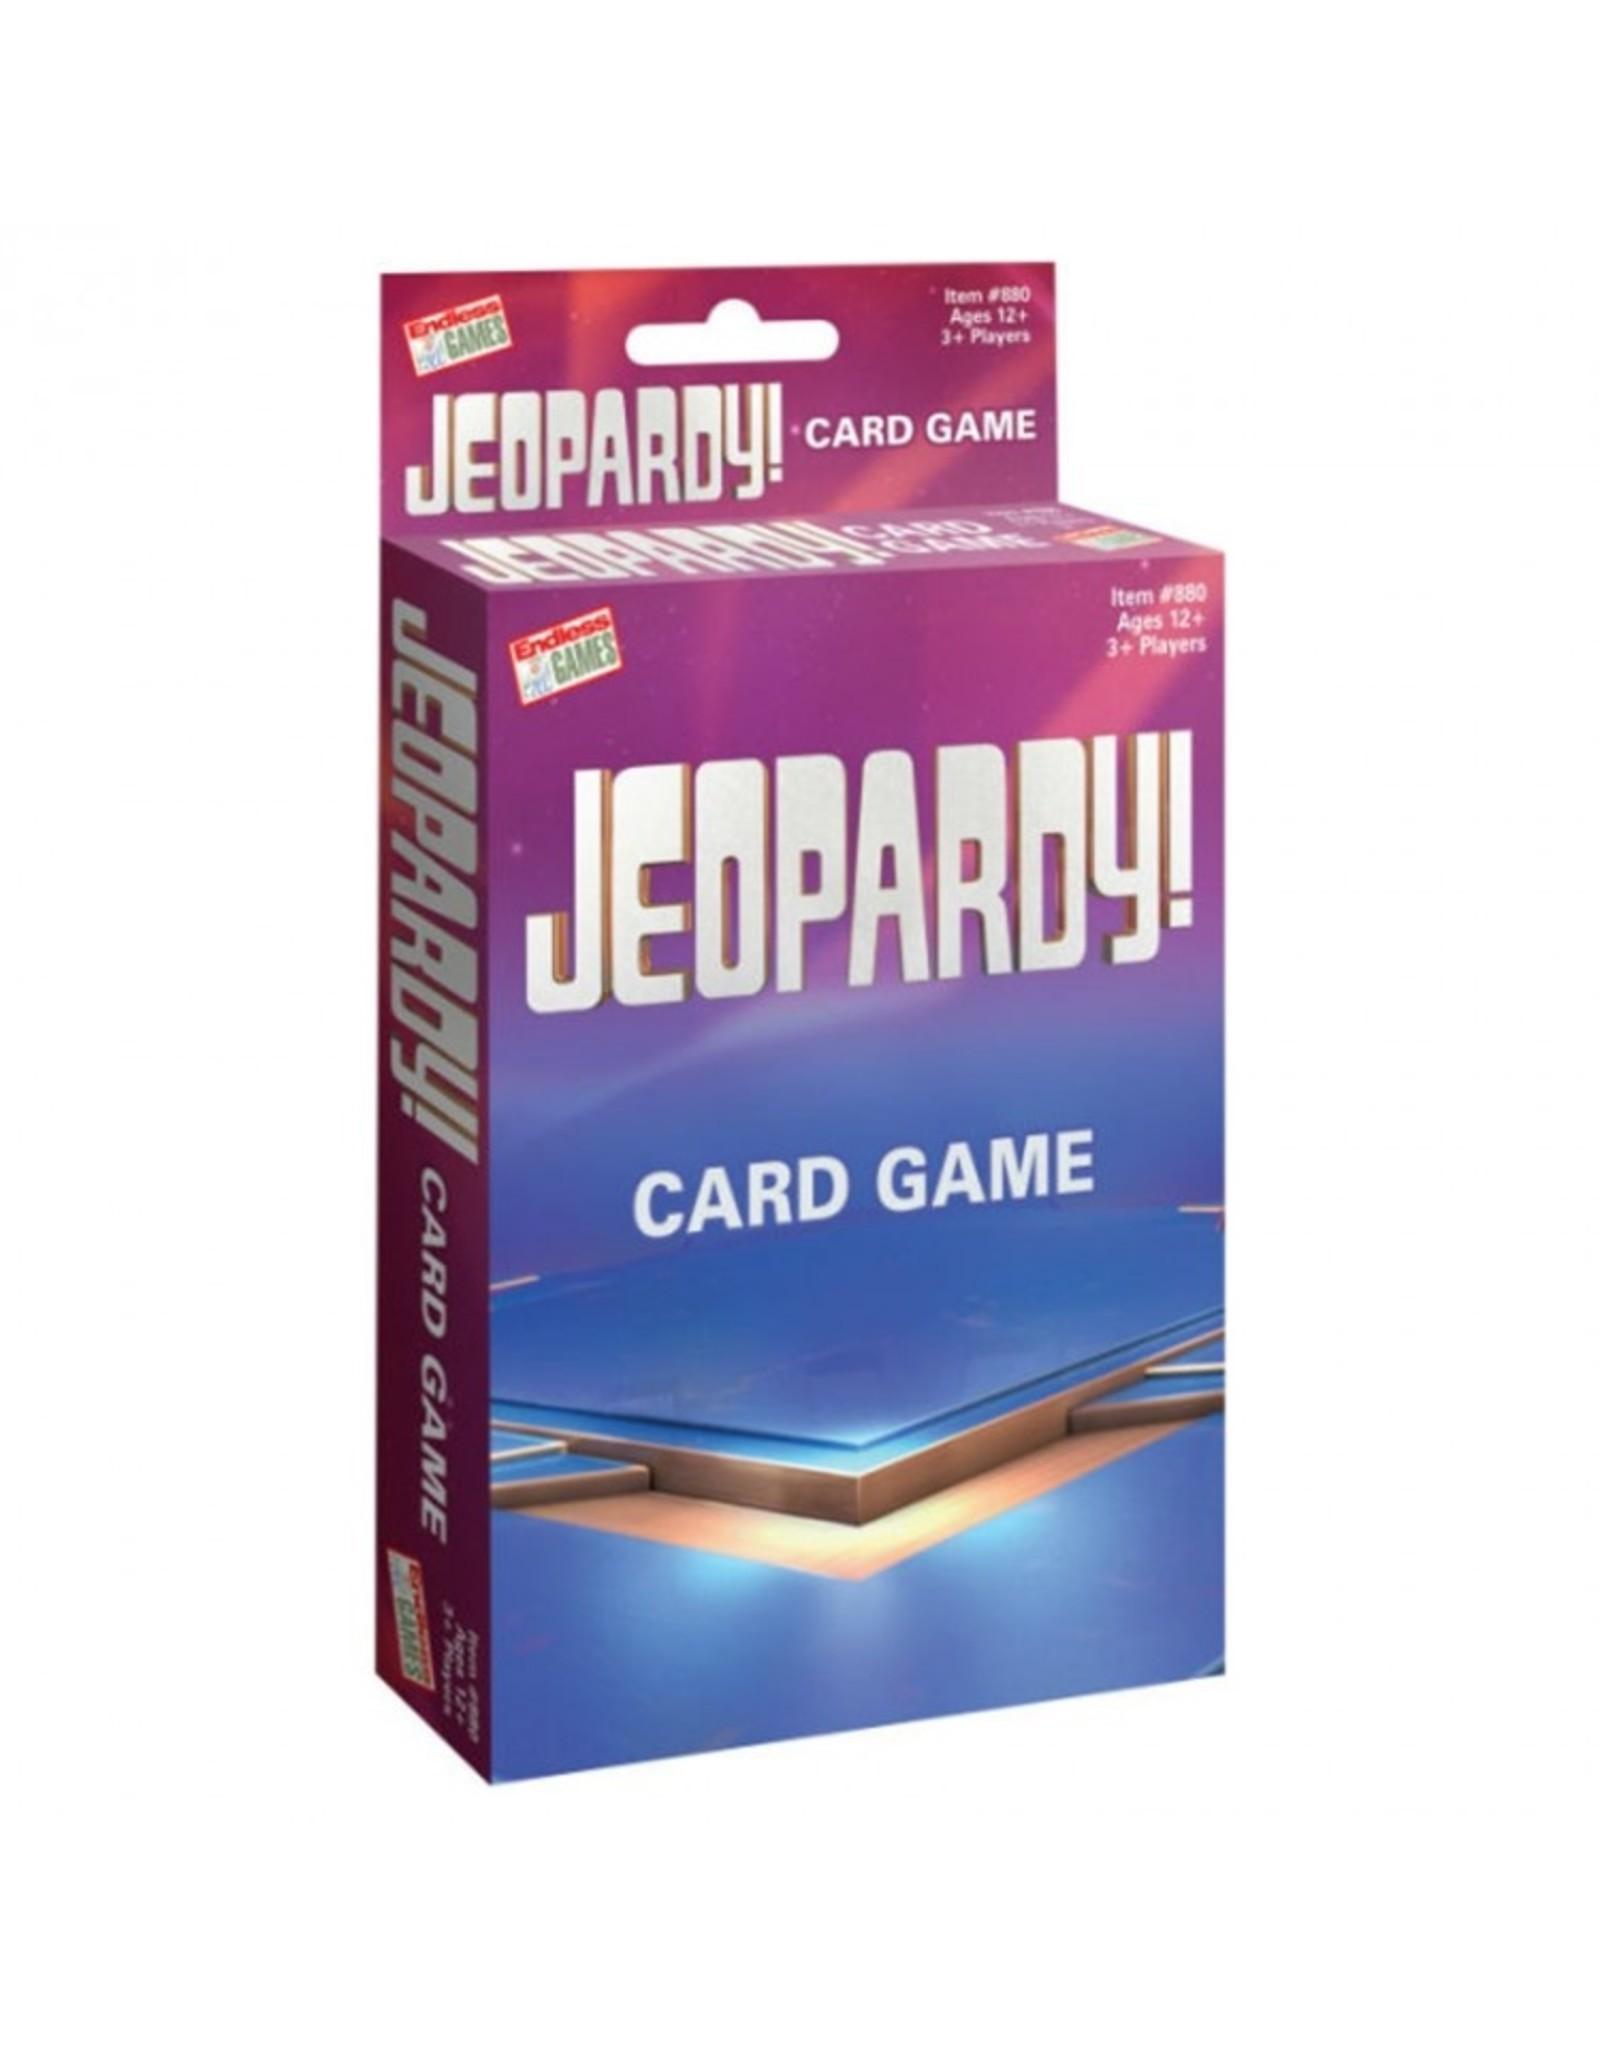 Jeopardy! Card Game